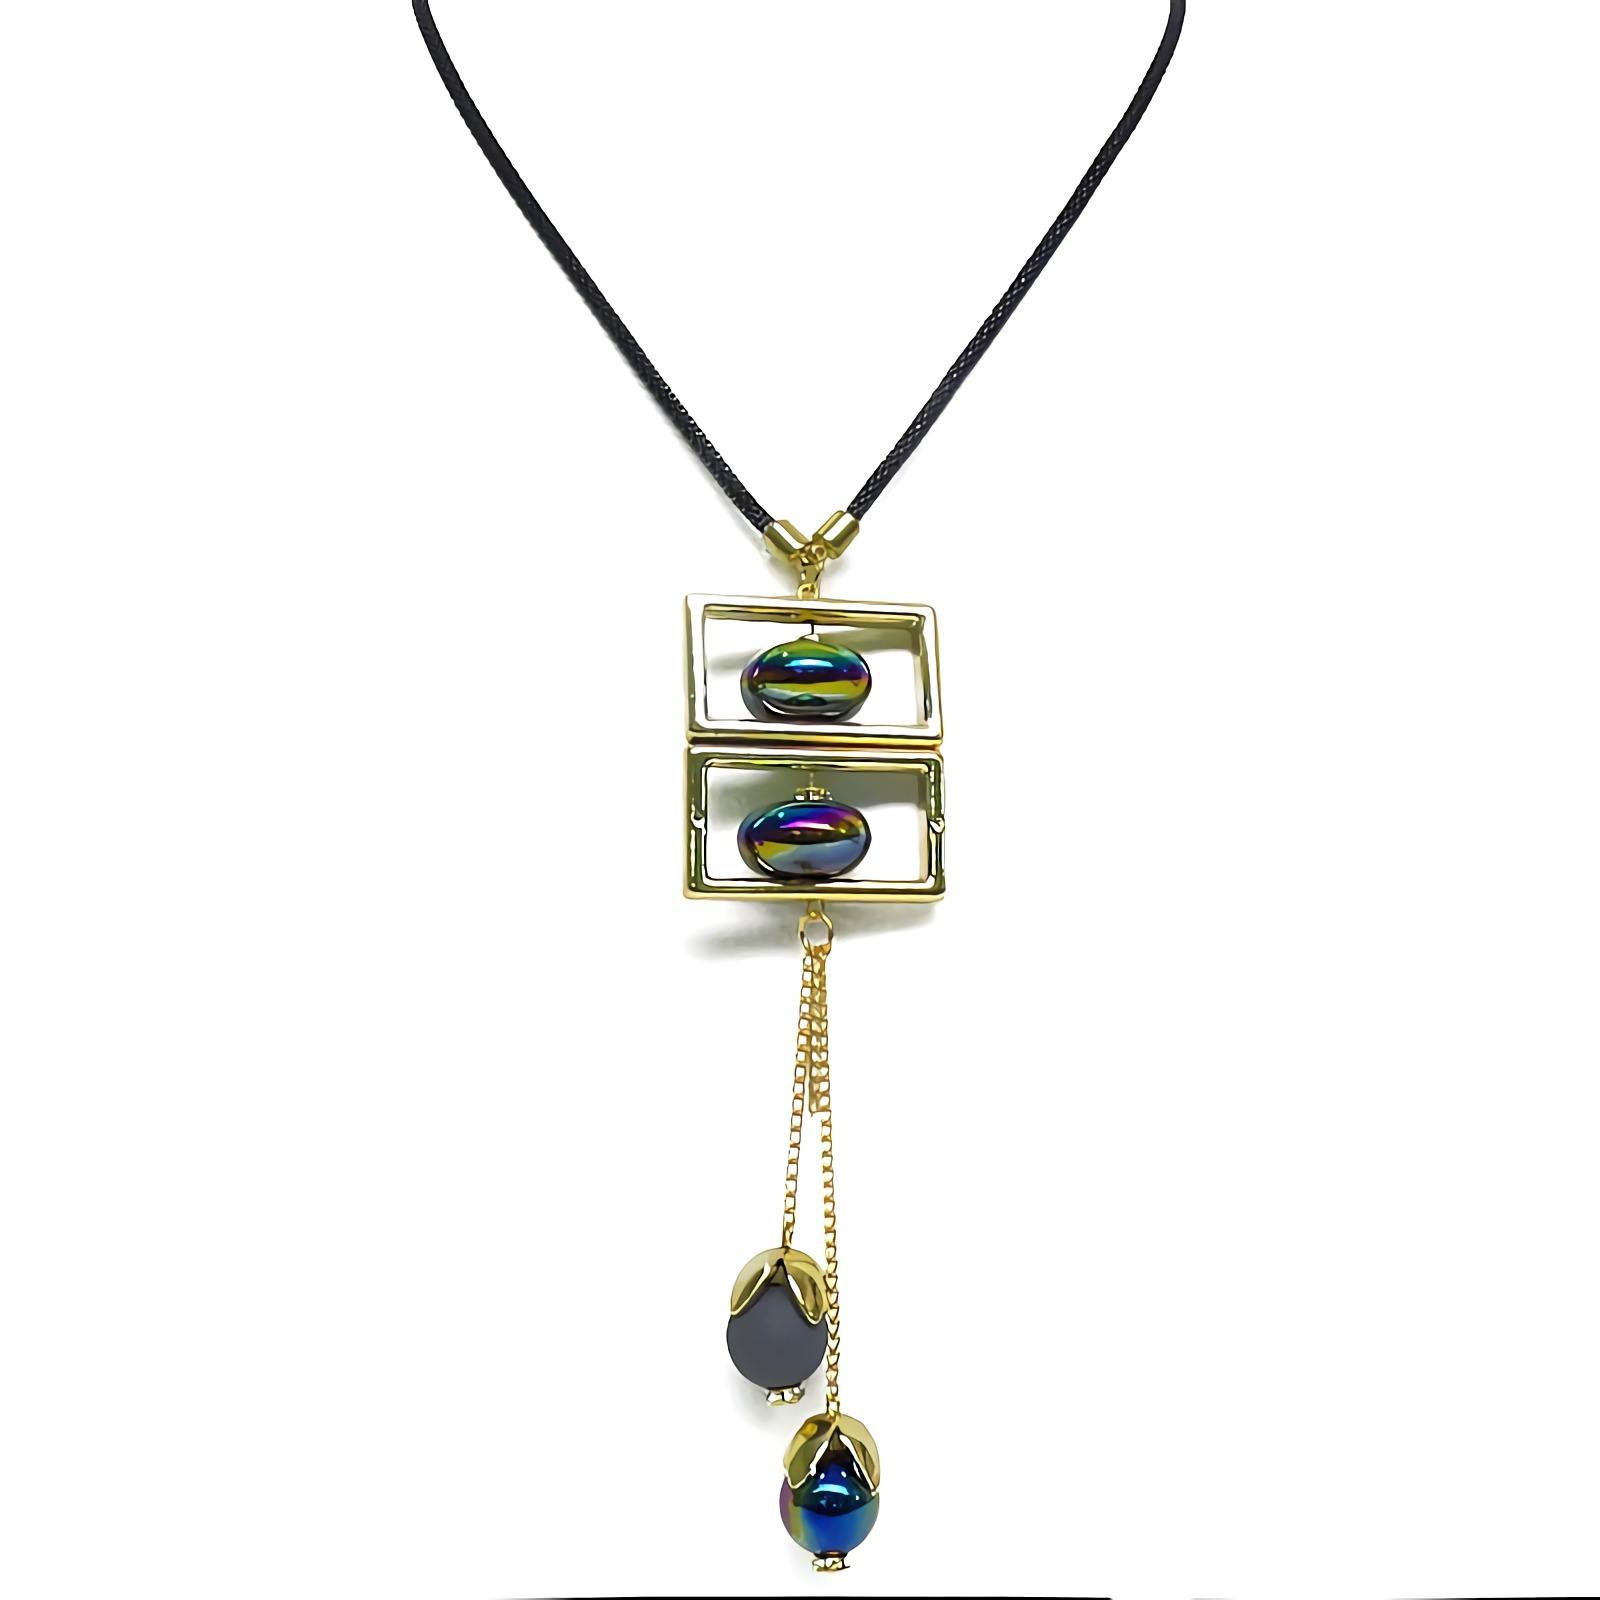 OFASHION Aksesoris Kalung CA-180314-K007 Necklace Fashion Xuping Jewelry Hitam MerahIDR10028. Rp 10.028